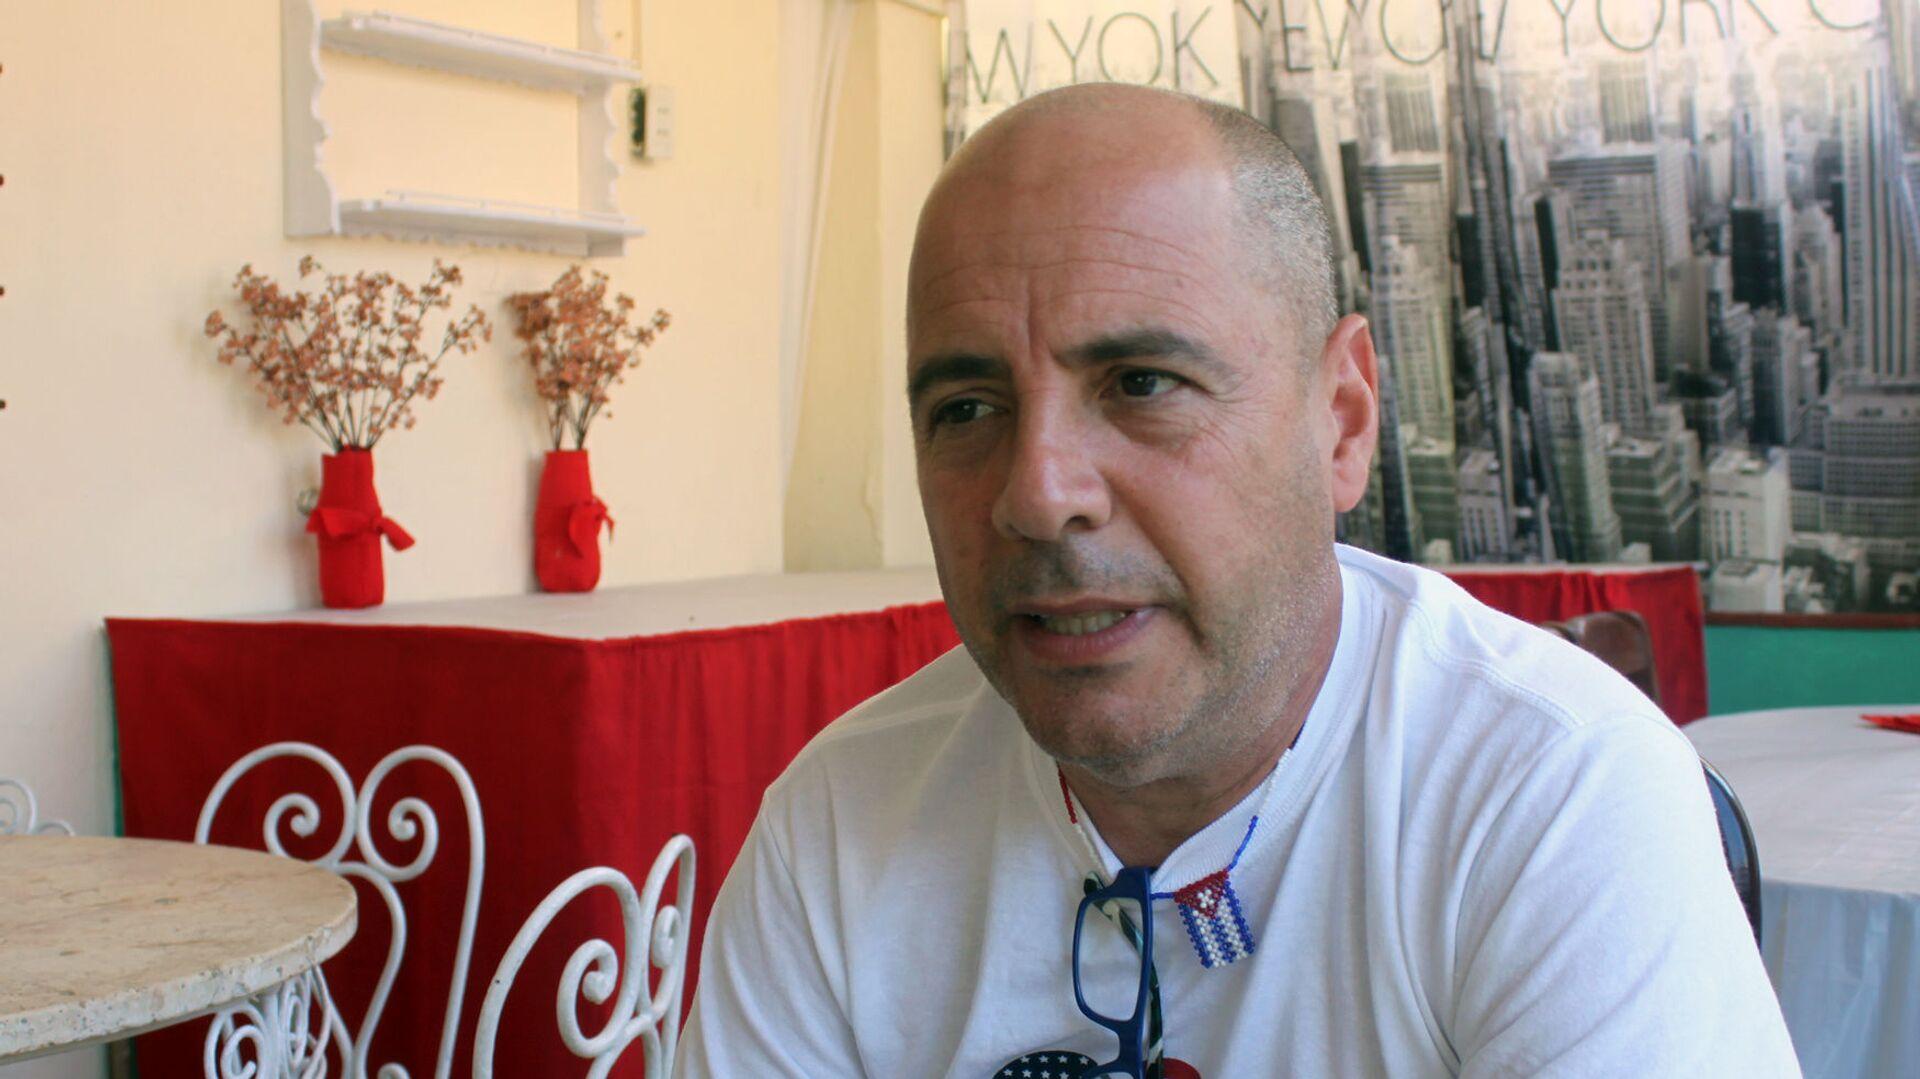 Carlos Lazo, profesor cubanoamericano residente en EEUU - Sputnik Mundo, 1920, 23.06.2021